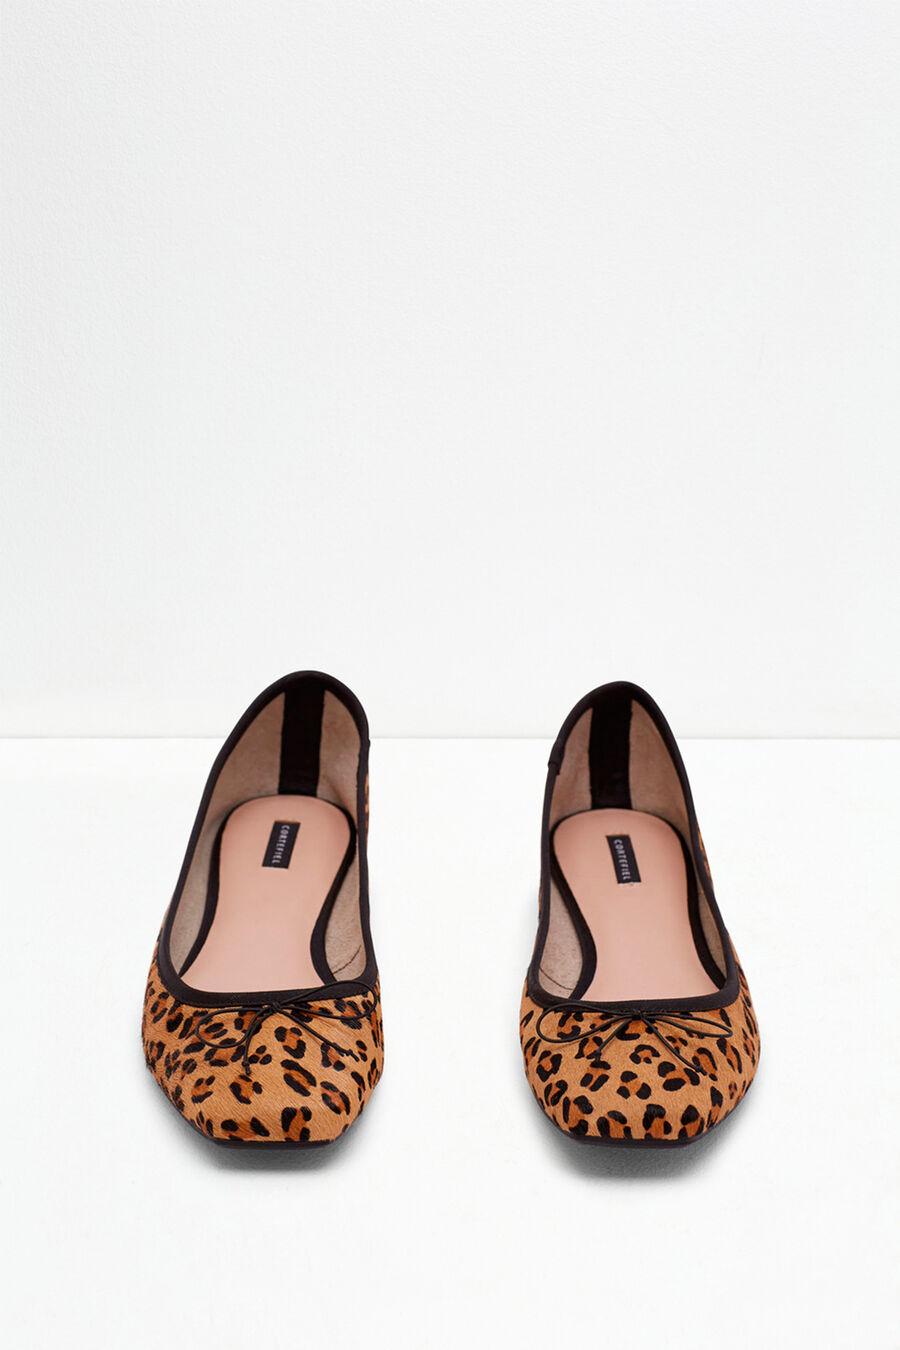 Bow ballerina flat shoes